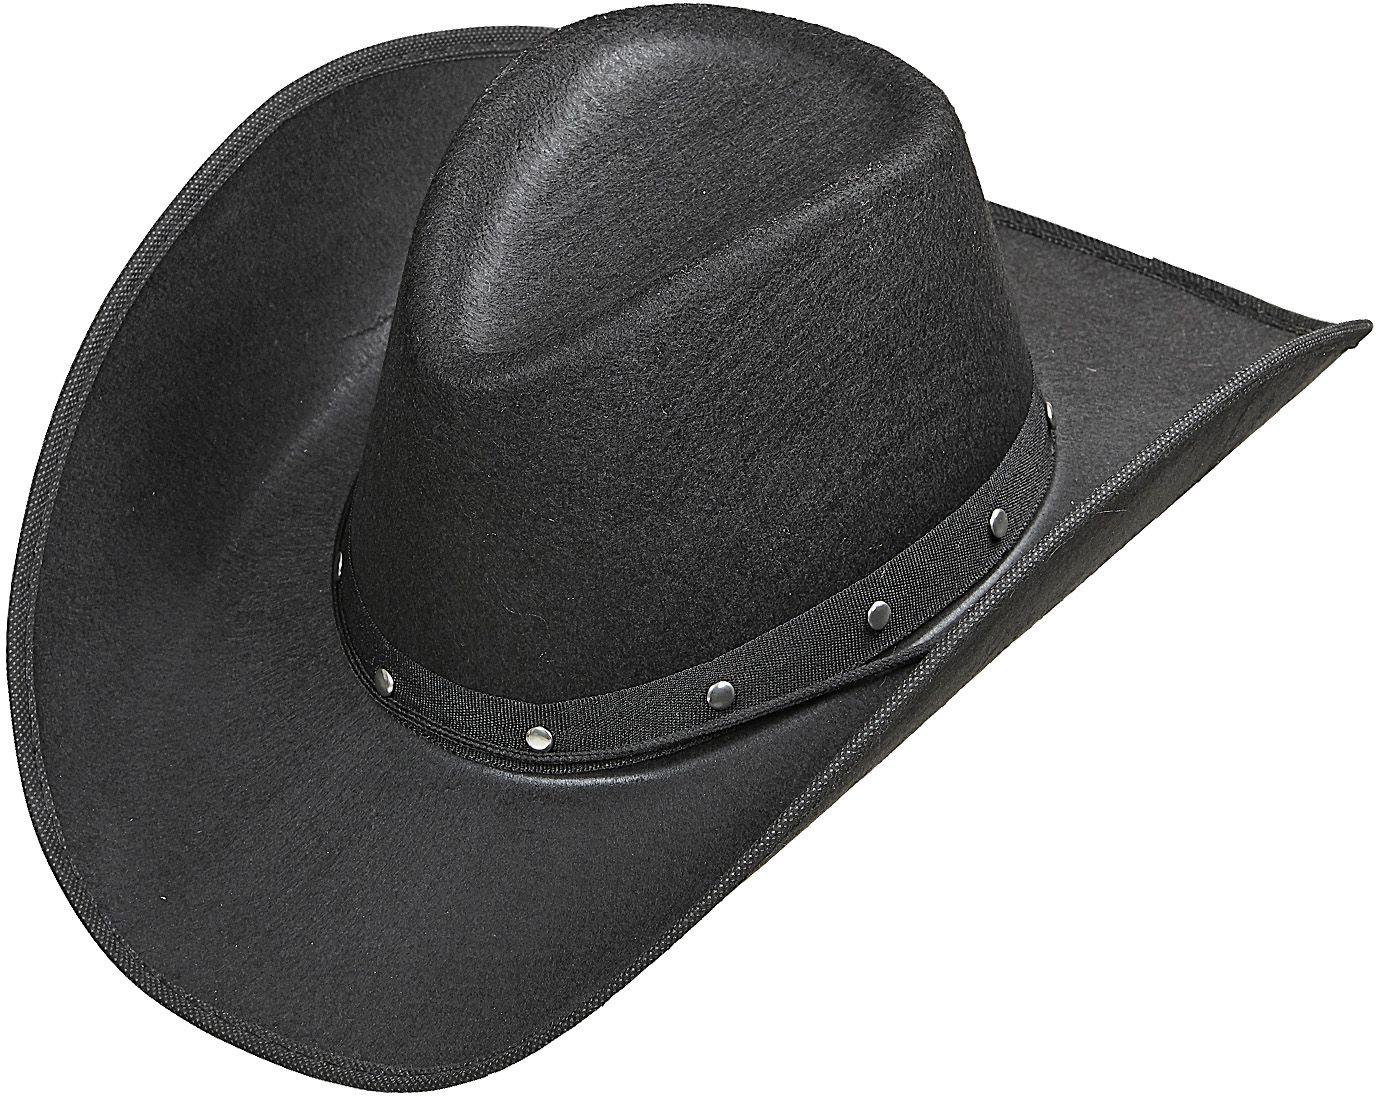 Beslagen cowboyhoed